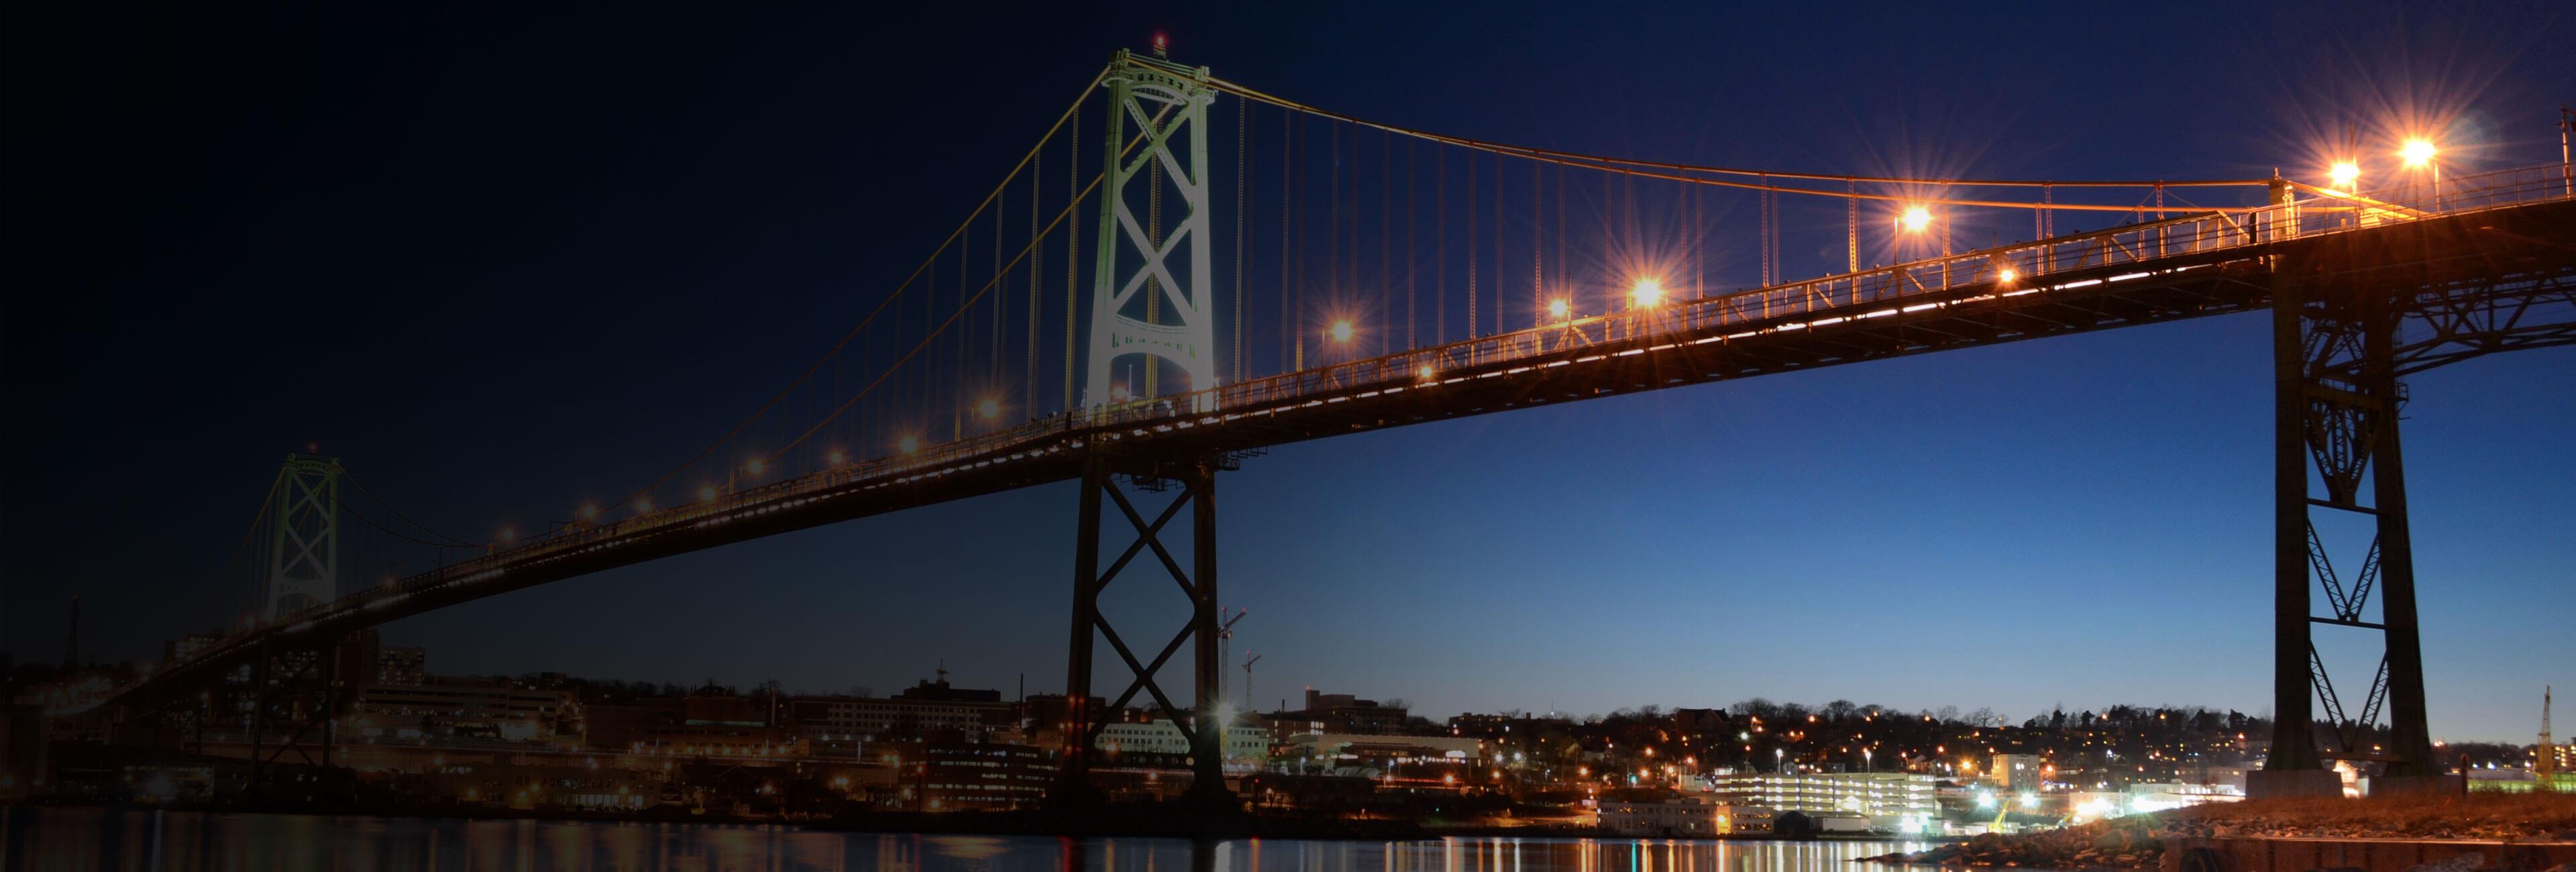 Bridge between Dartmouth and Halifax Nova Scotia